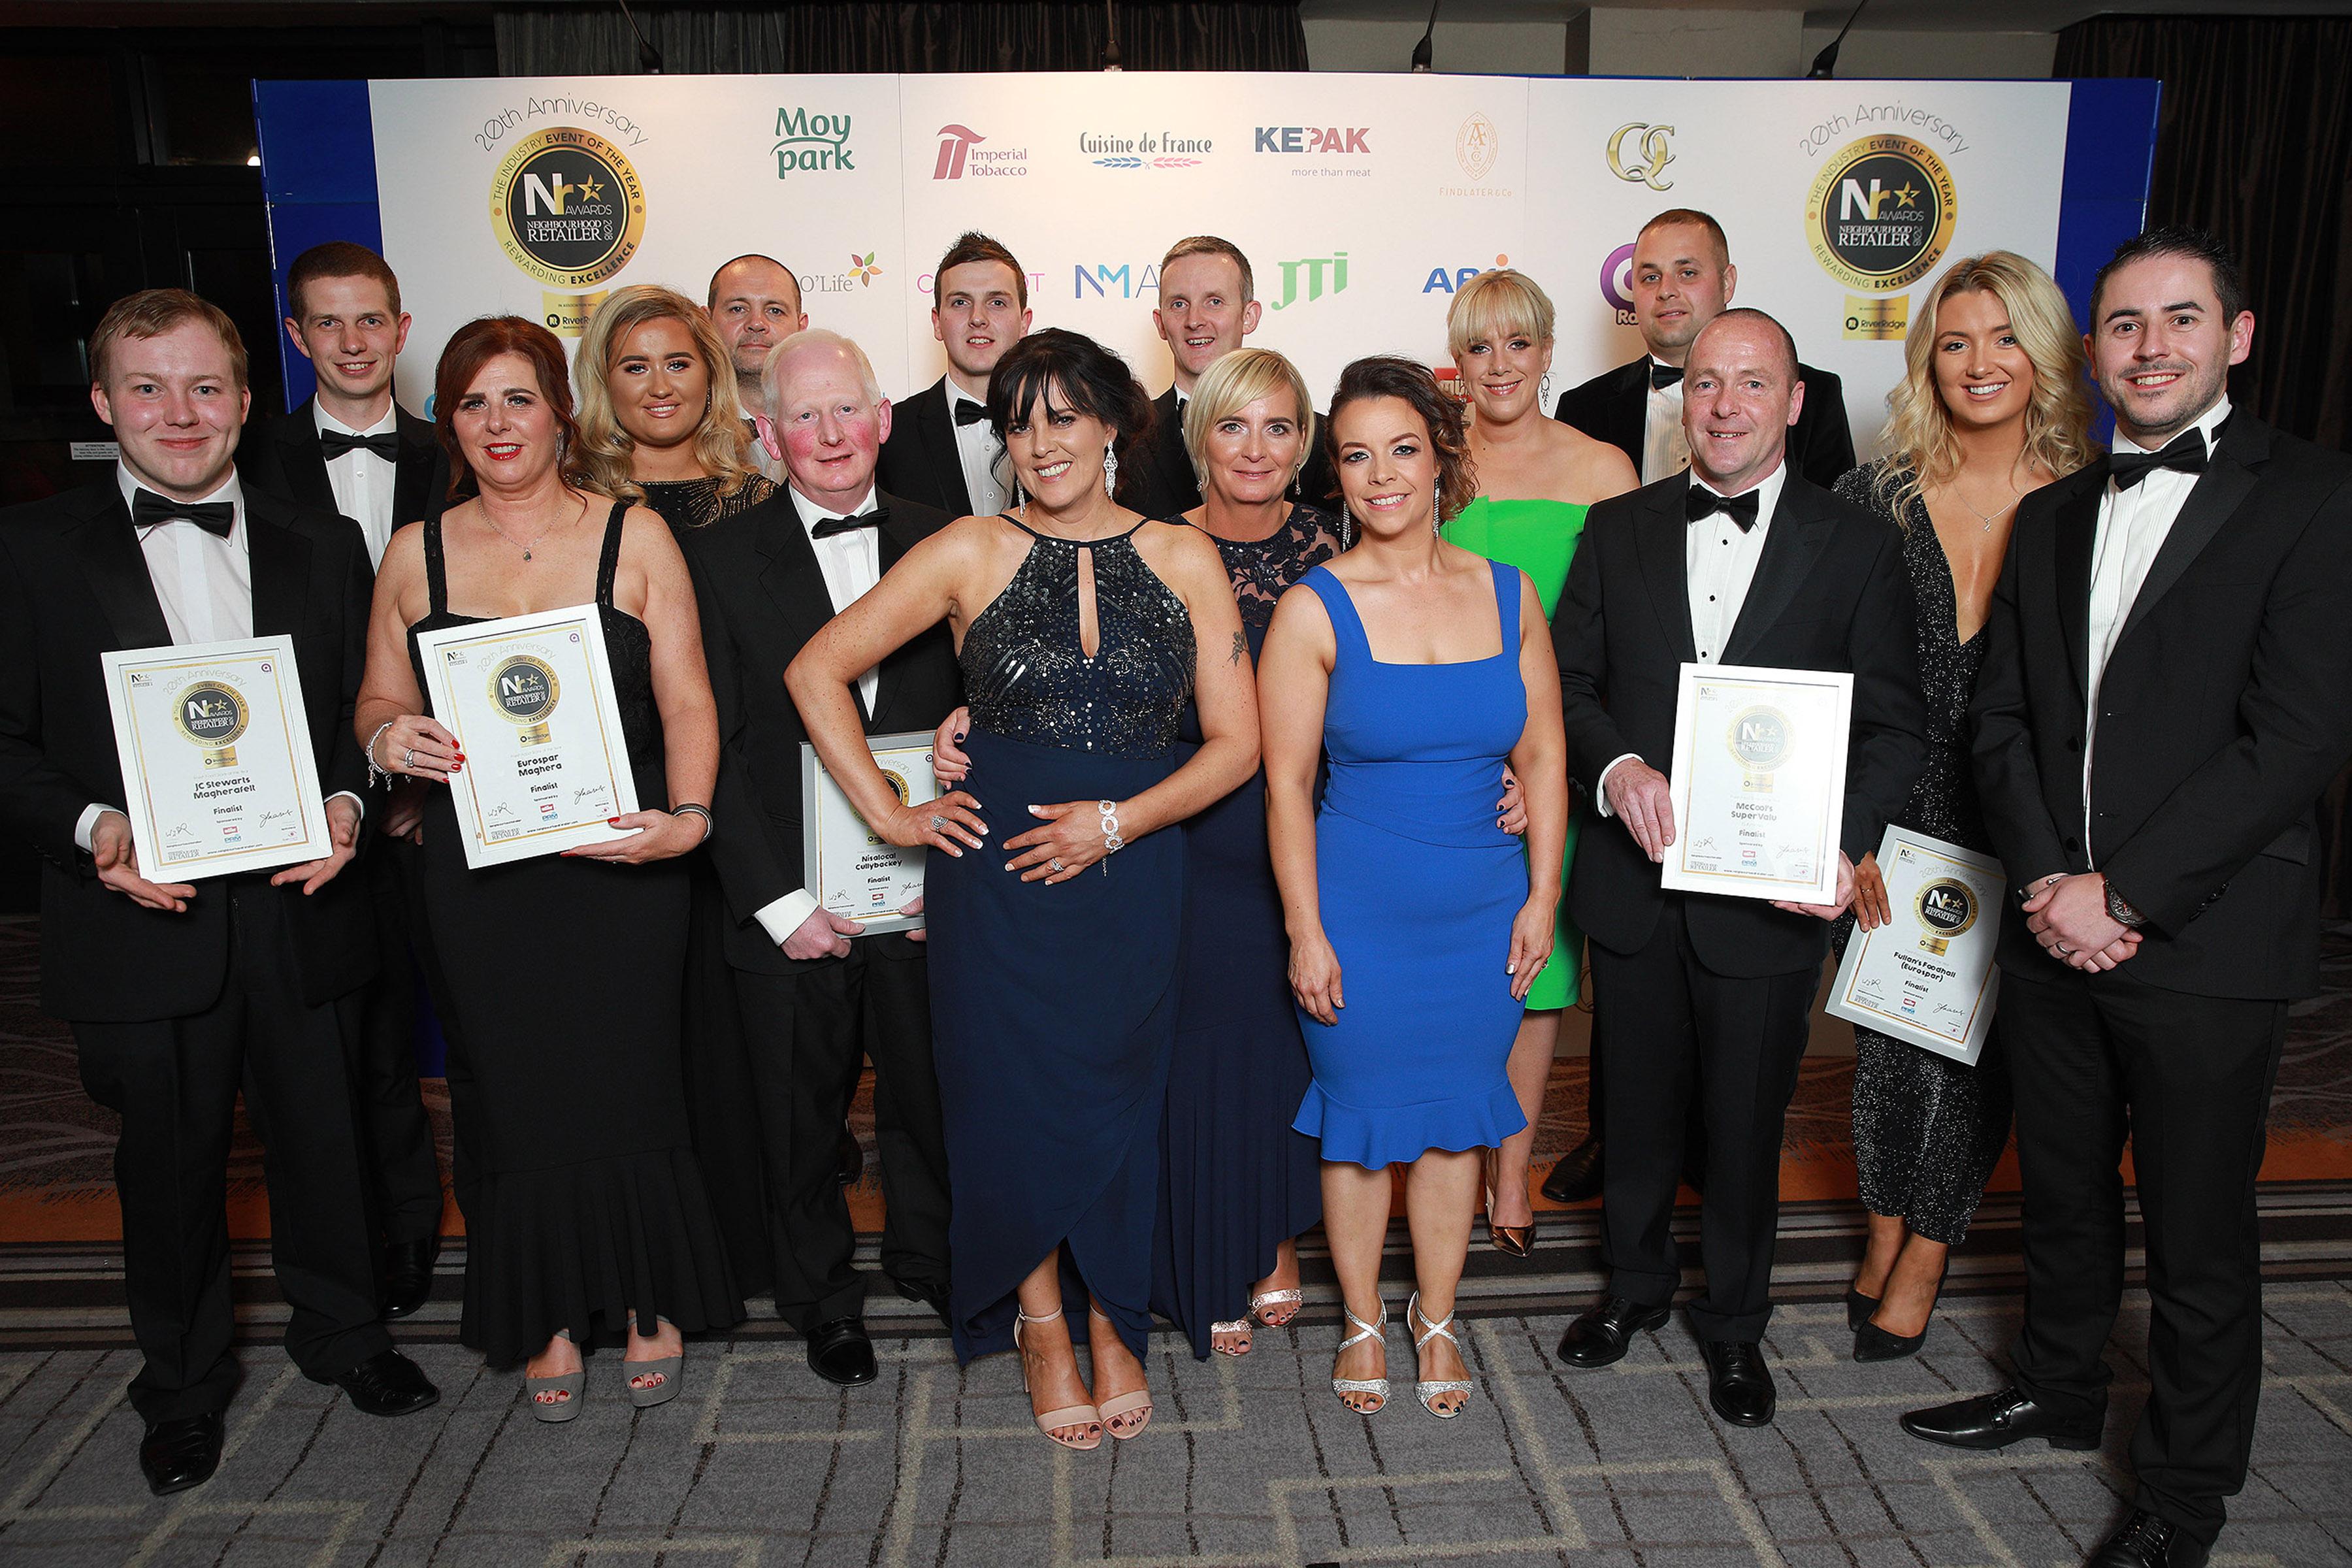 Neighbourhood Retailer Awards 2018 - Fresh Food Store of the Year finalists